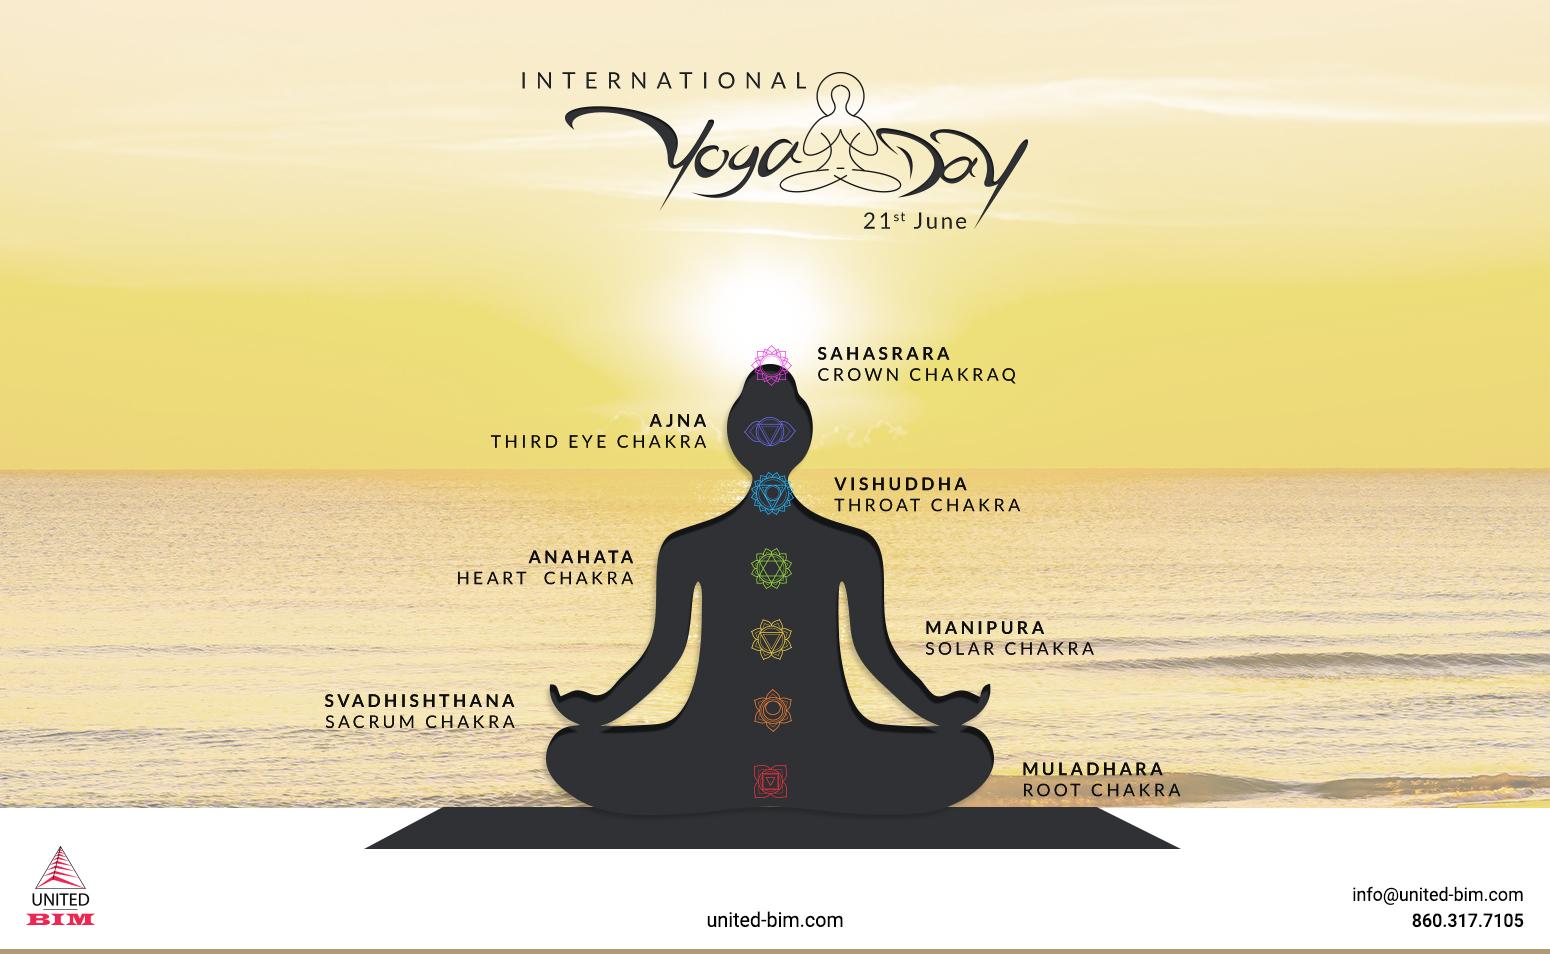 Yoga Day 2021 Graphic by United-BIM